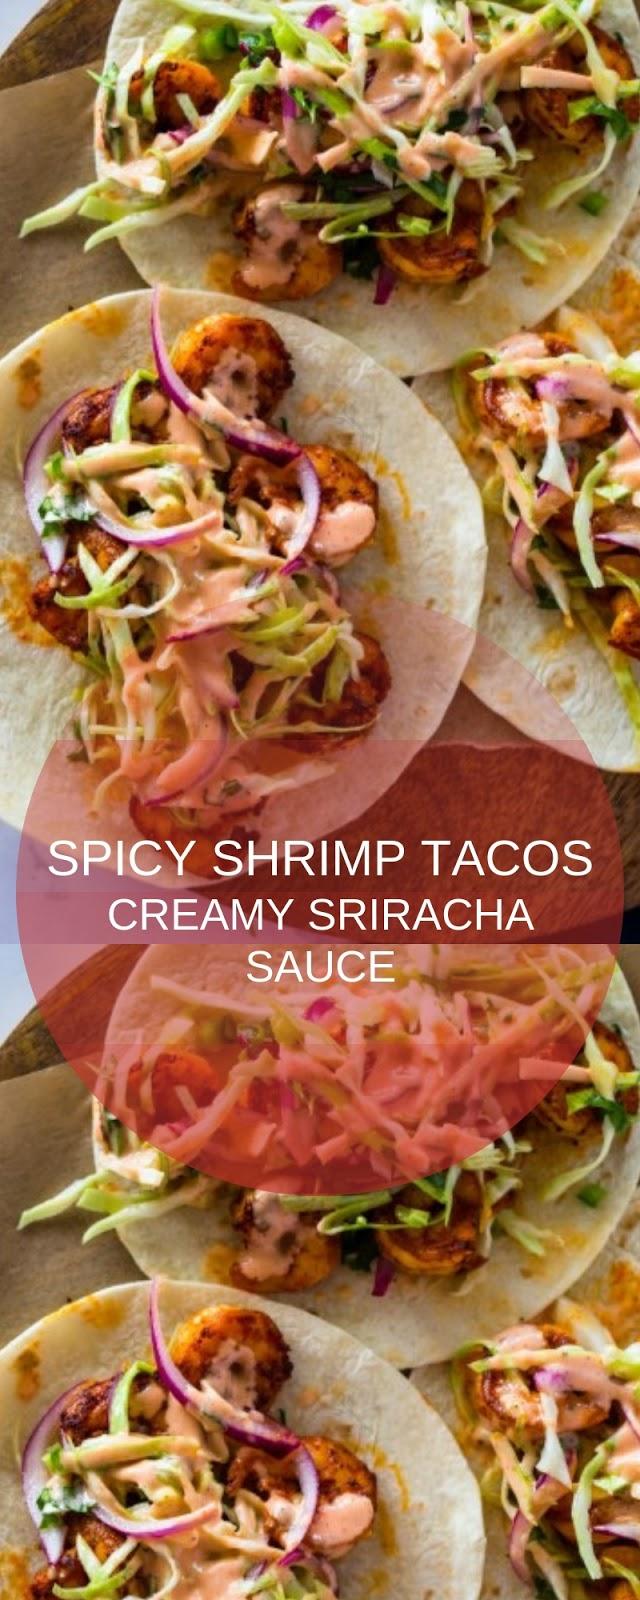 SPICY SHRIMP TACOS WITH CREAMY SRIRACHA SAUCE